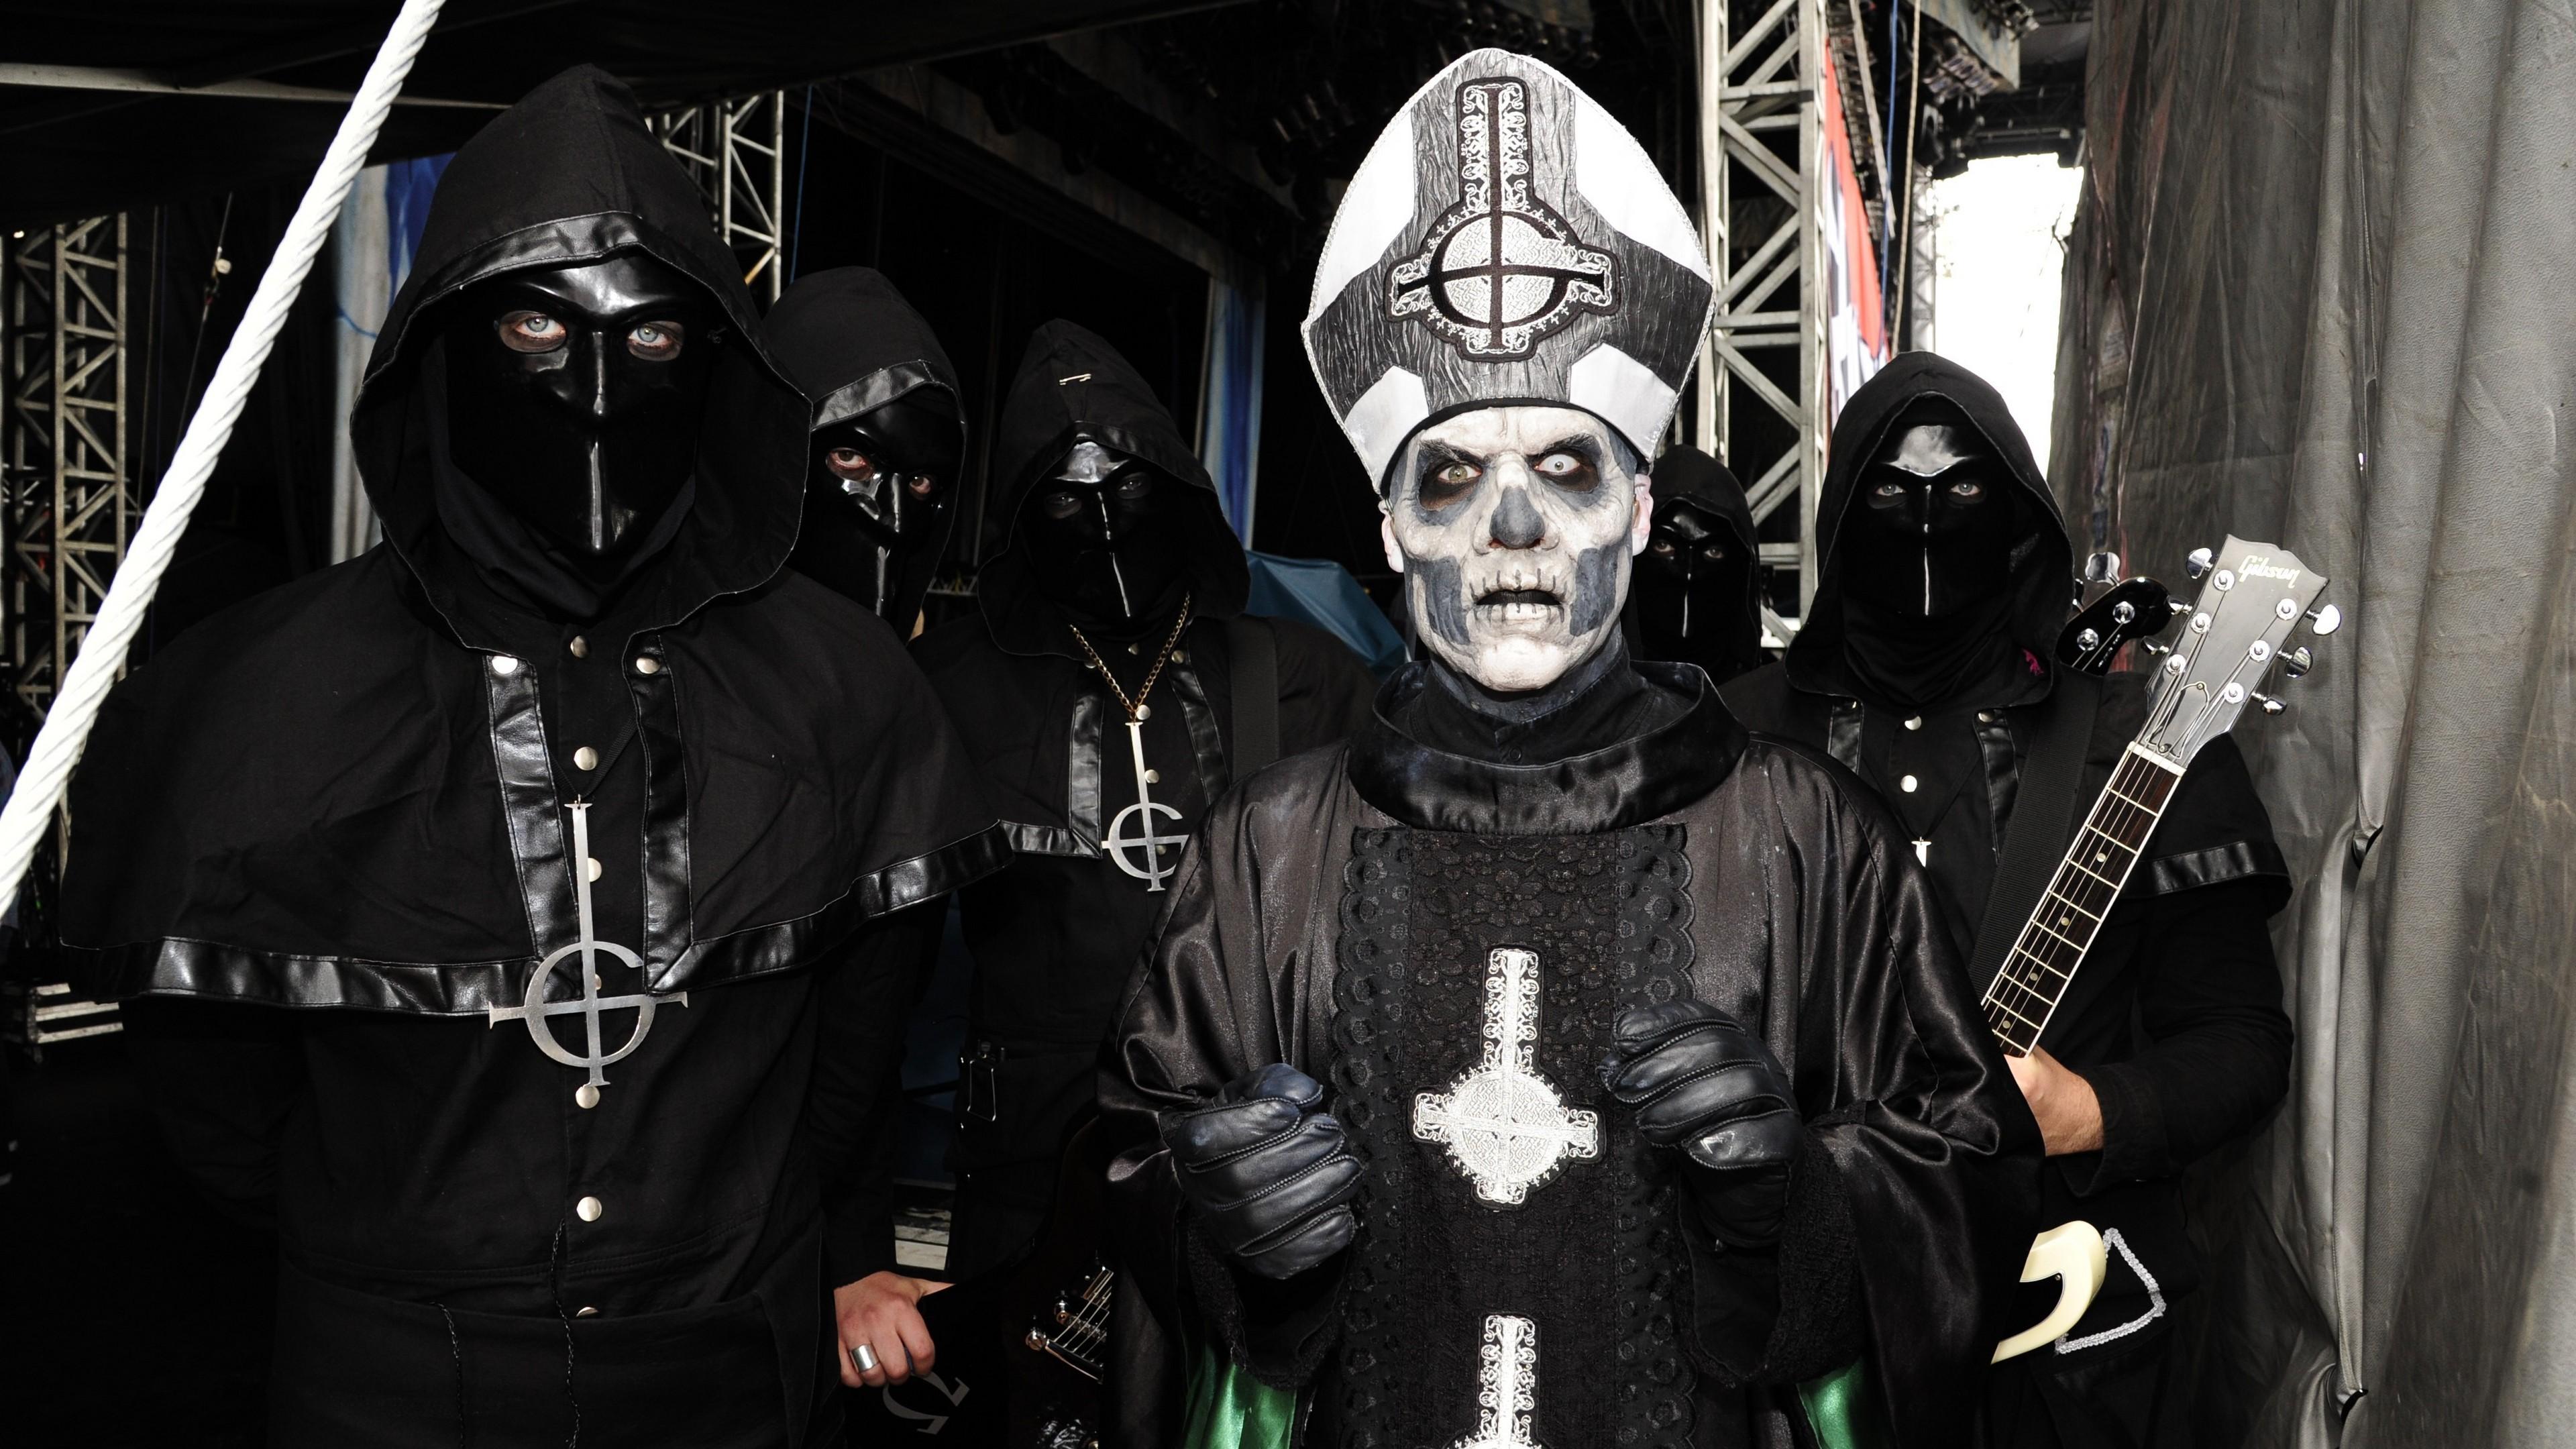 Res: 3840x2160, Ghost Heavy Metal Swedish Band Satanic Dark Wallpaper